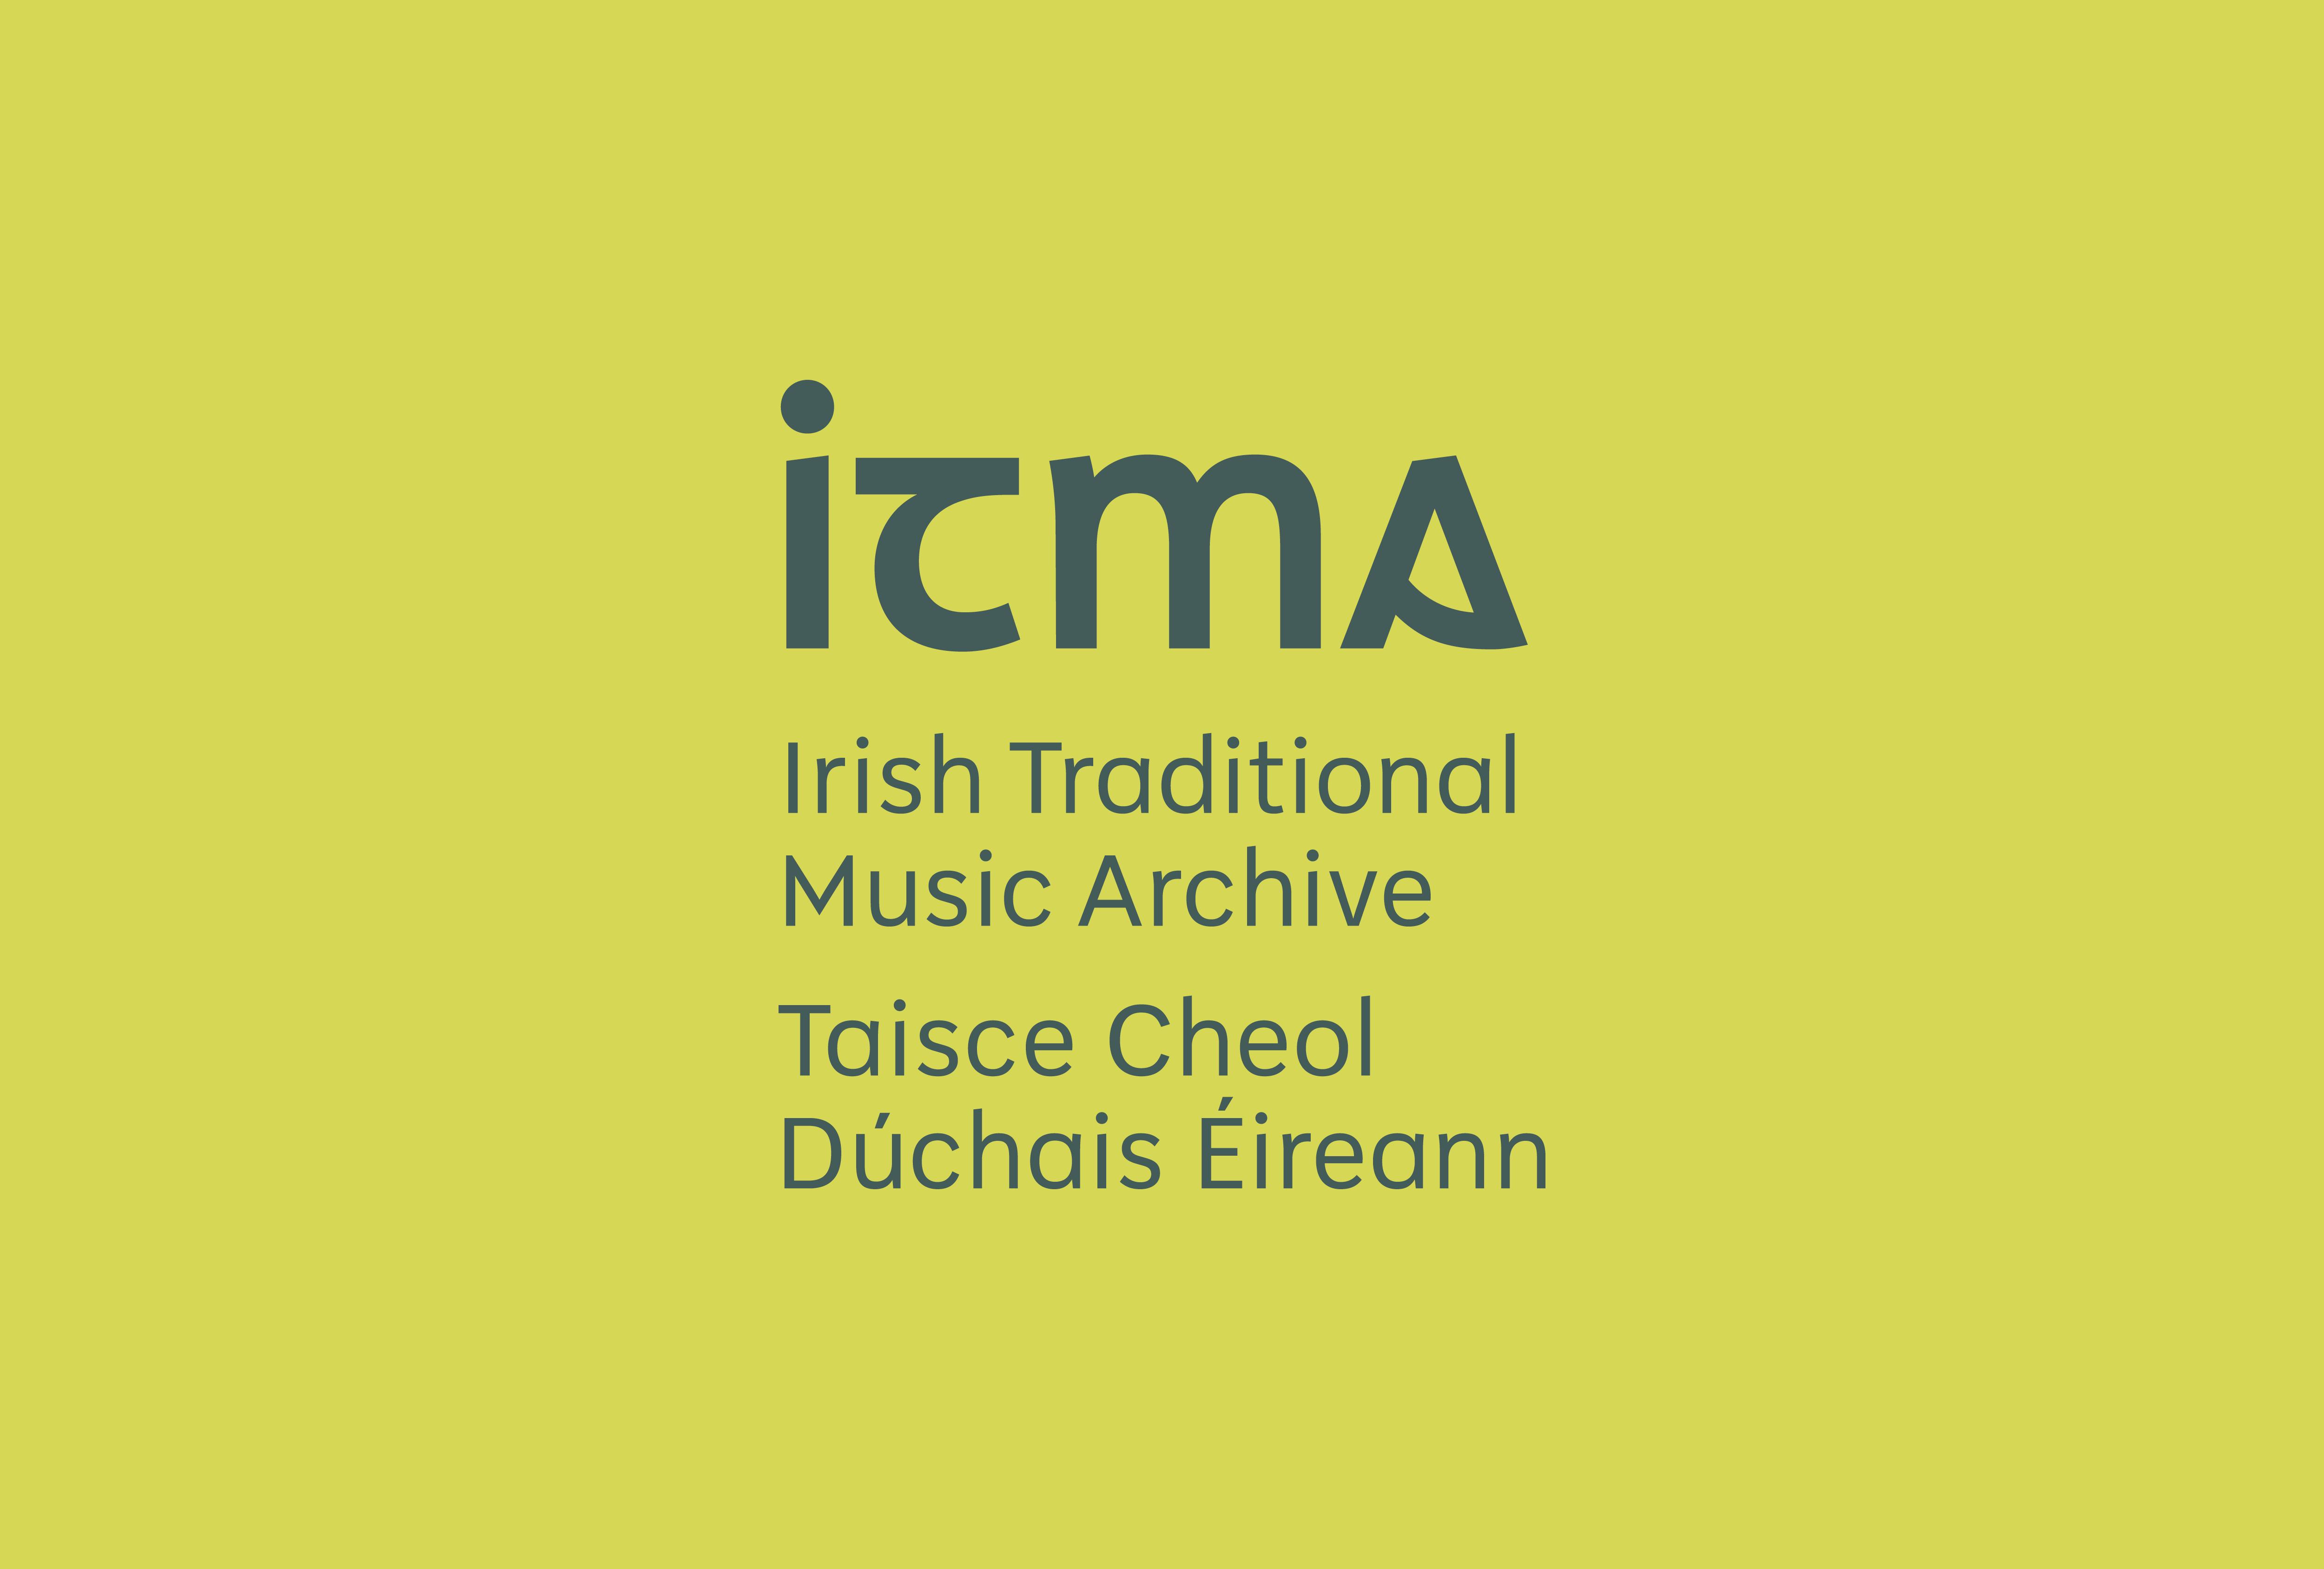 Cover image: ITMA Rebrand